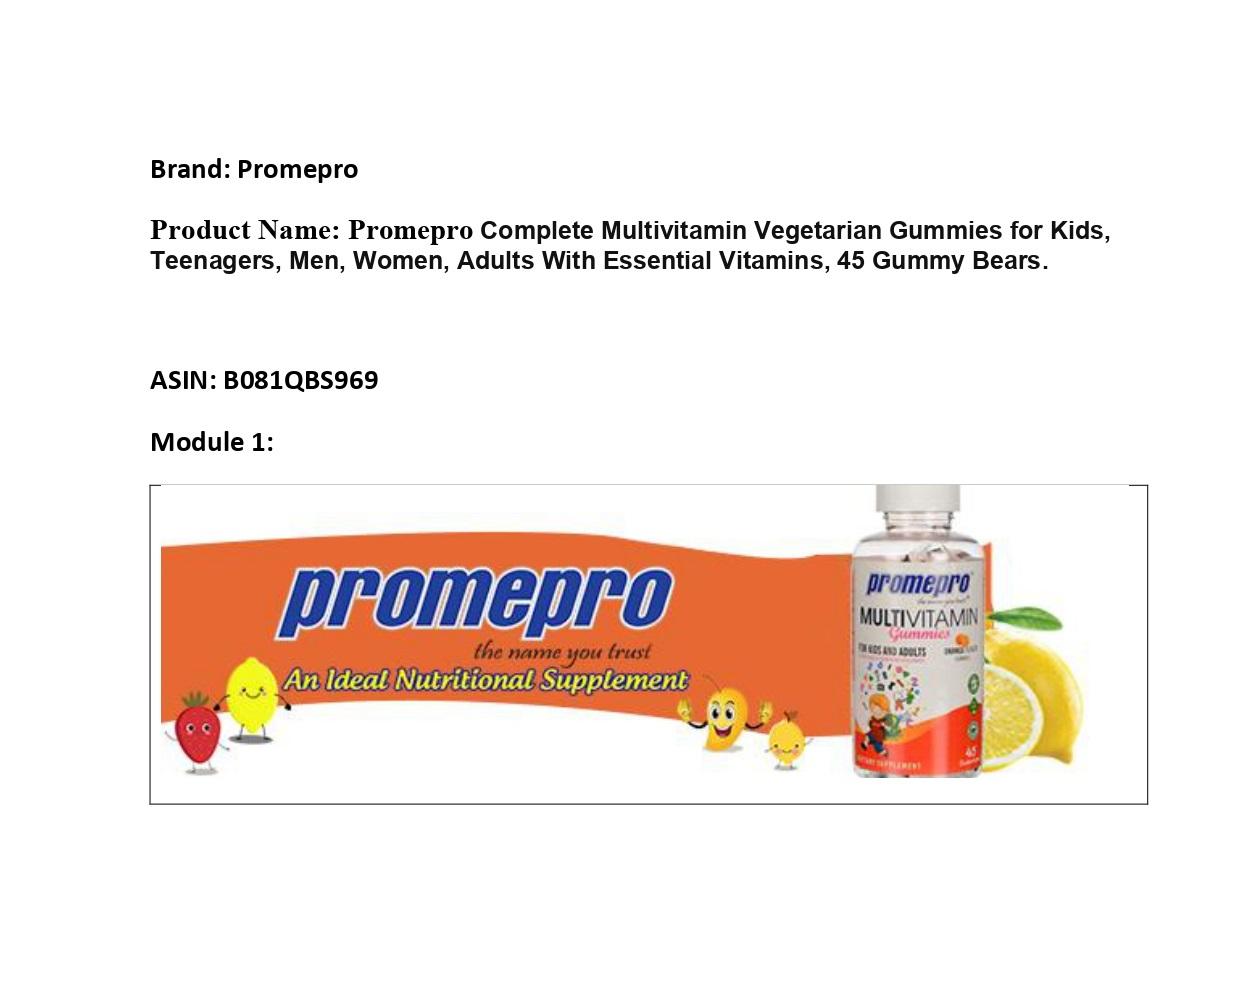 Promepro Multivitamin Gummies - Orange Flavor, 45 Gummies